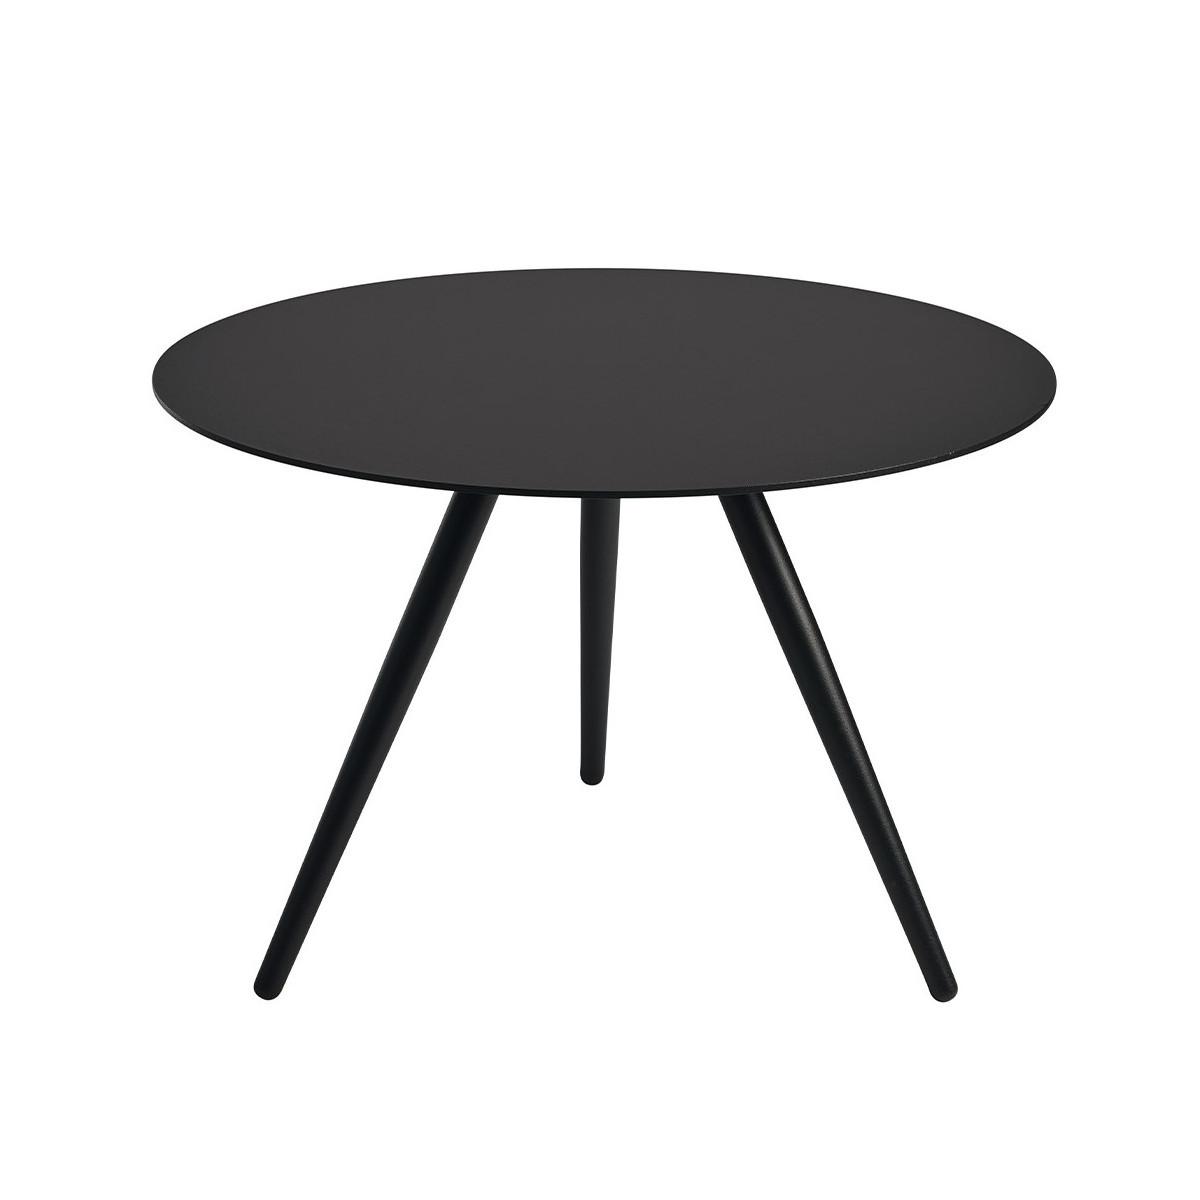 Swan Coffee Table - Résistub Productions